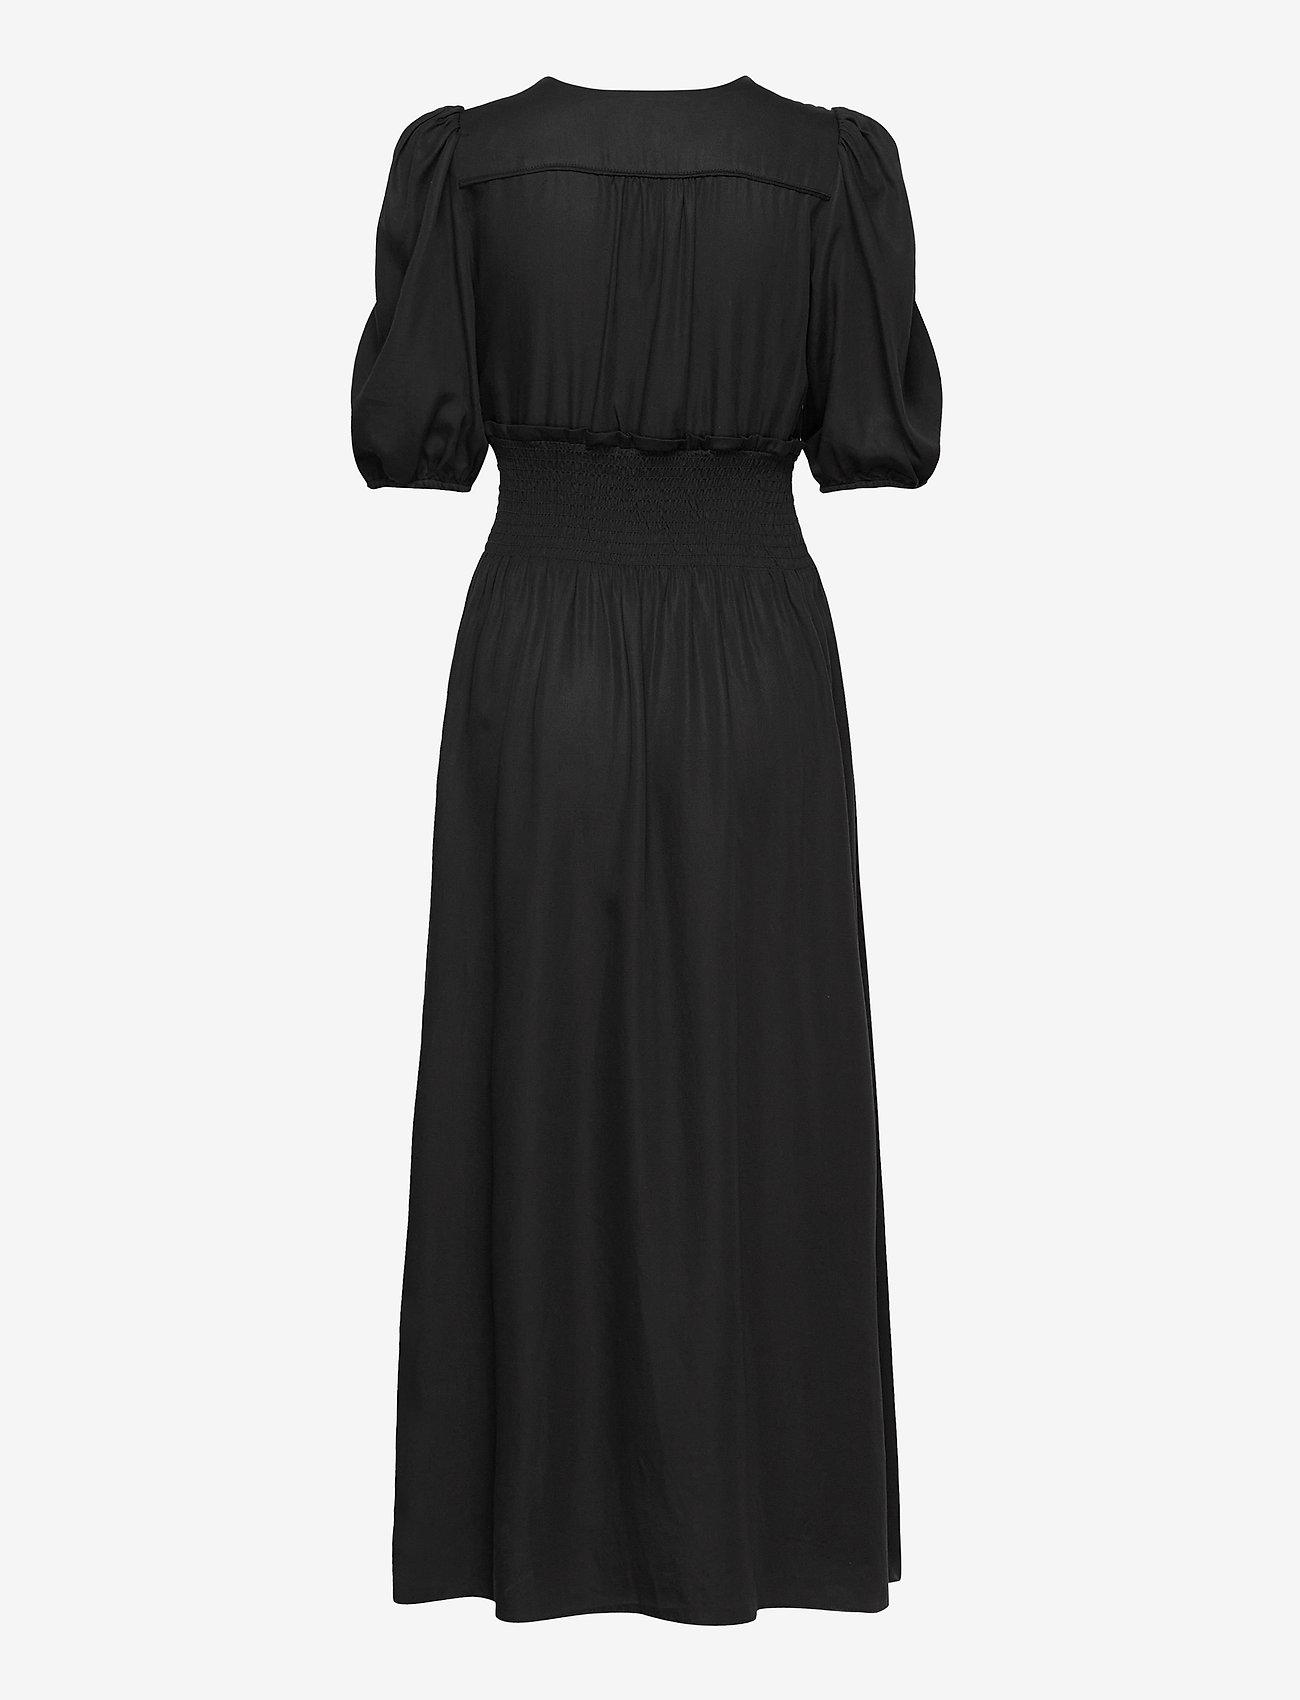 Chloe Puff Dress (Black) (131.25 €) - Storm & Marie b4r4G